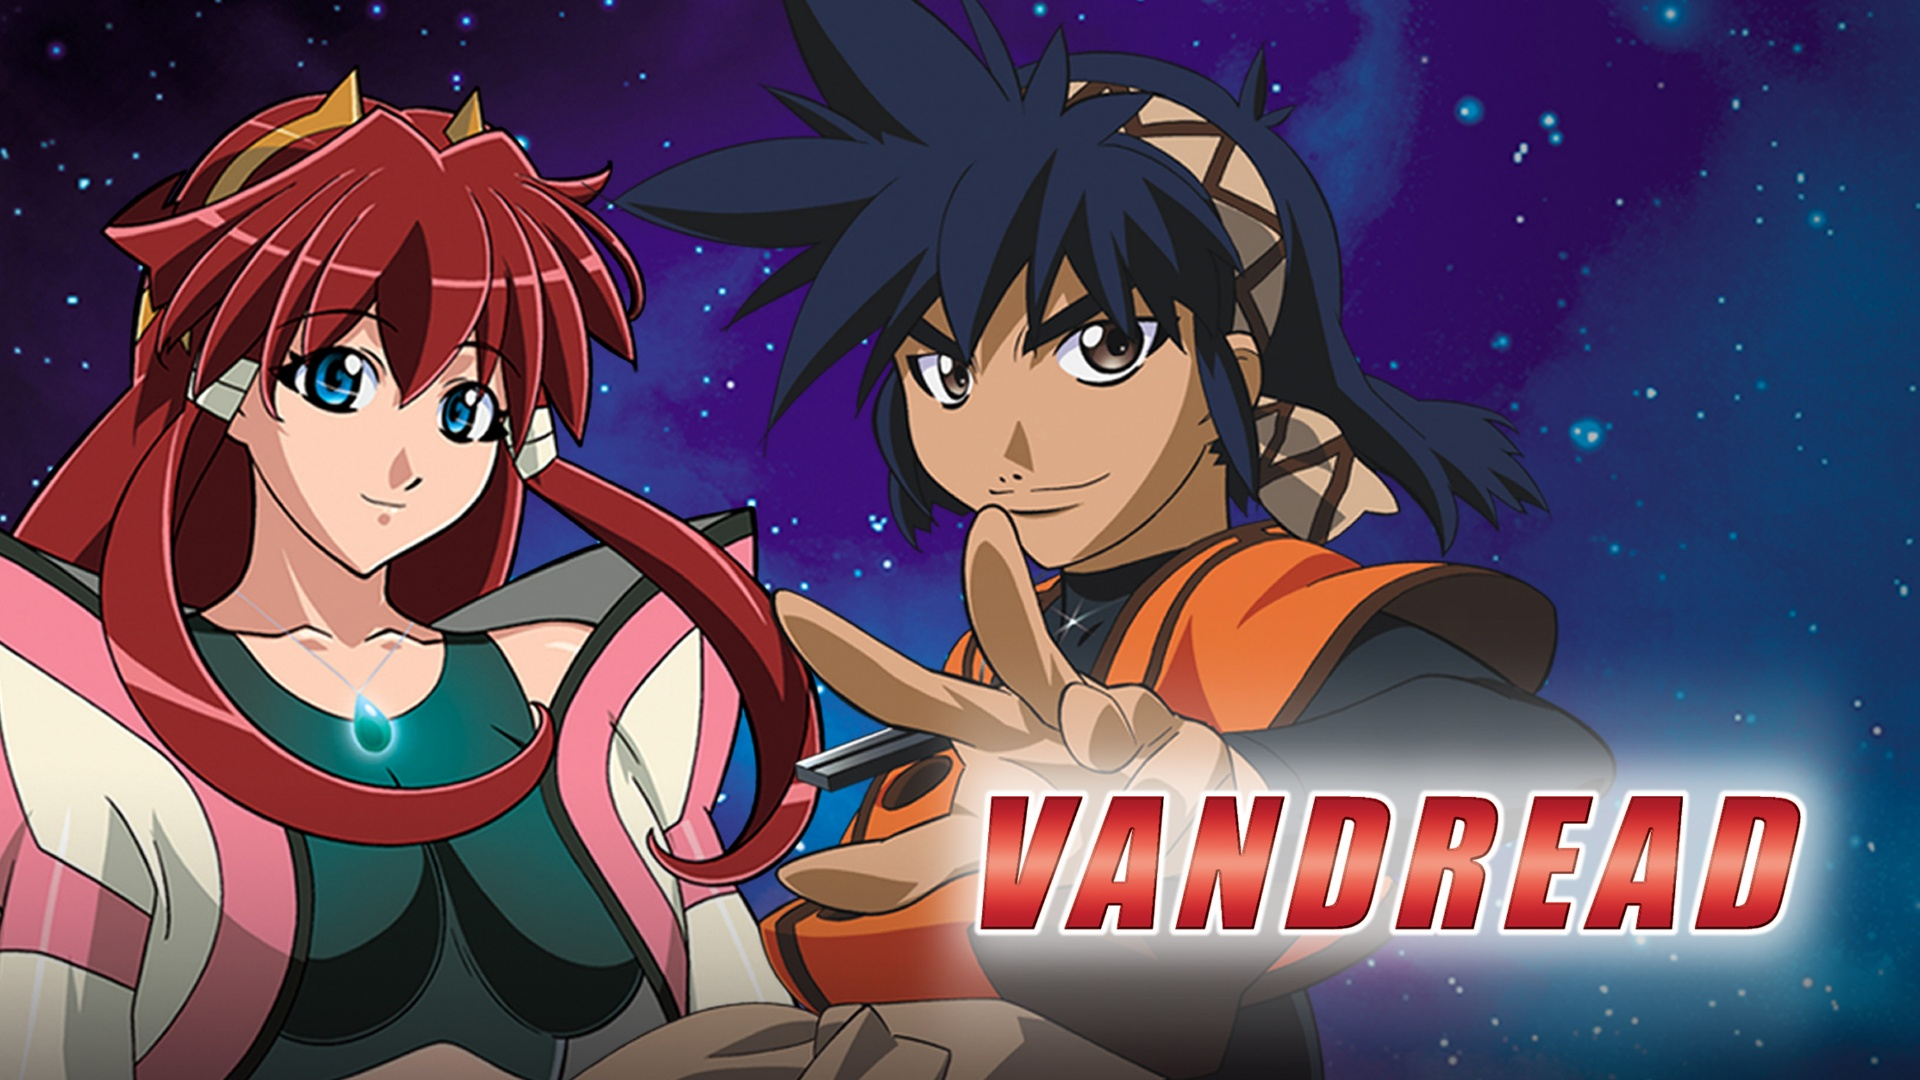 [ANIME] Vandread | Lat-Jap+Sub | 13/13 | DVDrip  Vandread